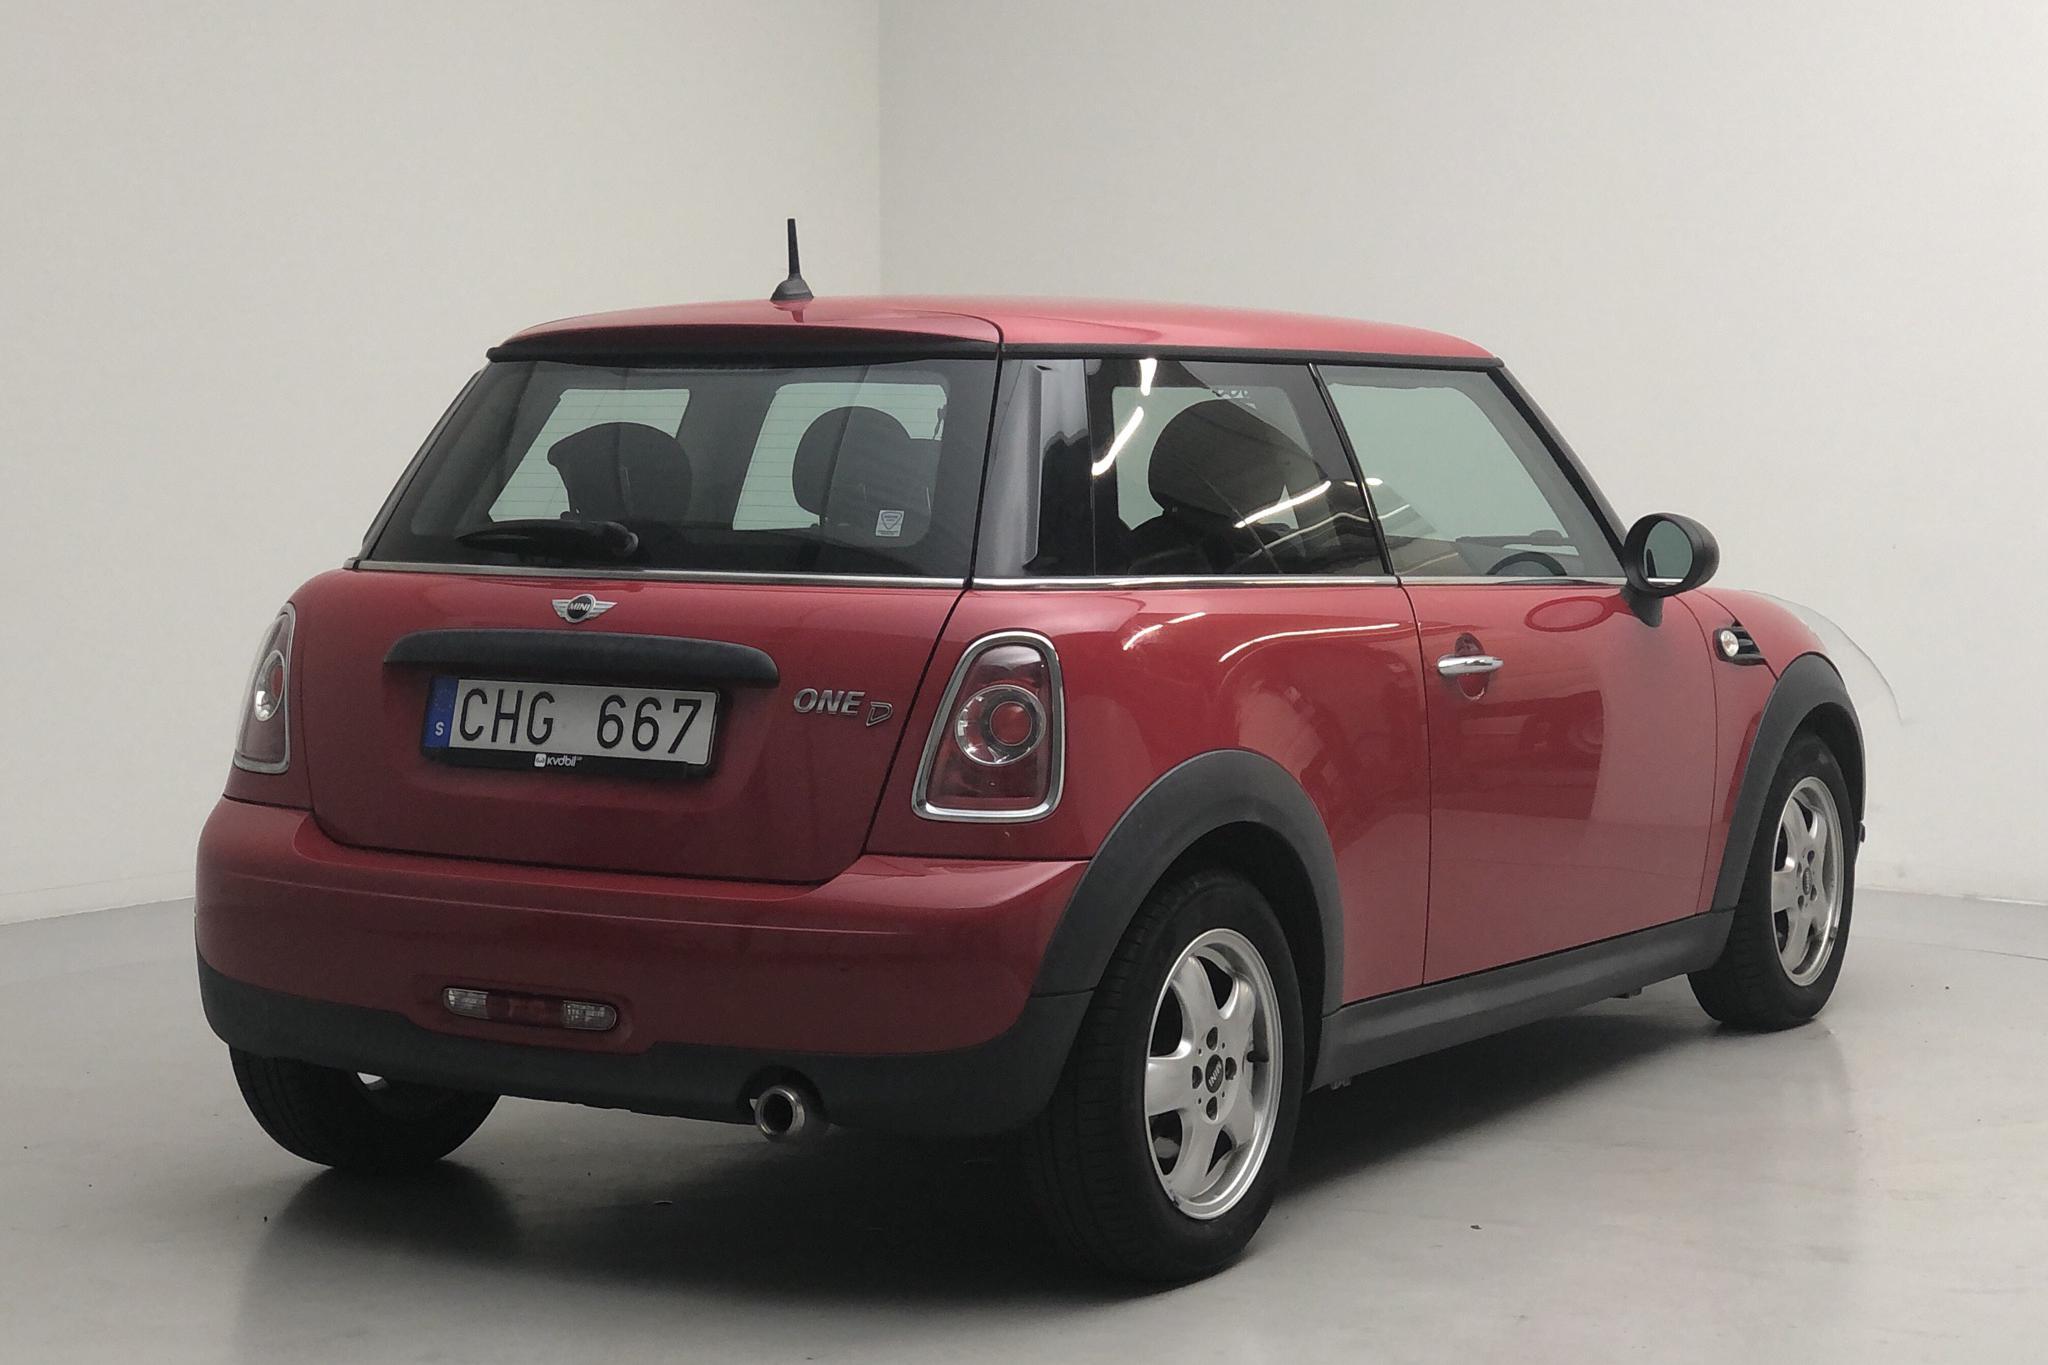 MINI One D 1.6 (90hk) - 12 968 mil - Manuell - röd - 2011